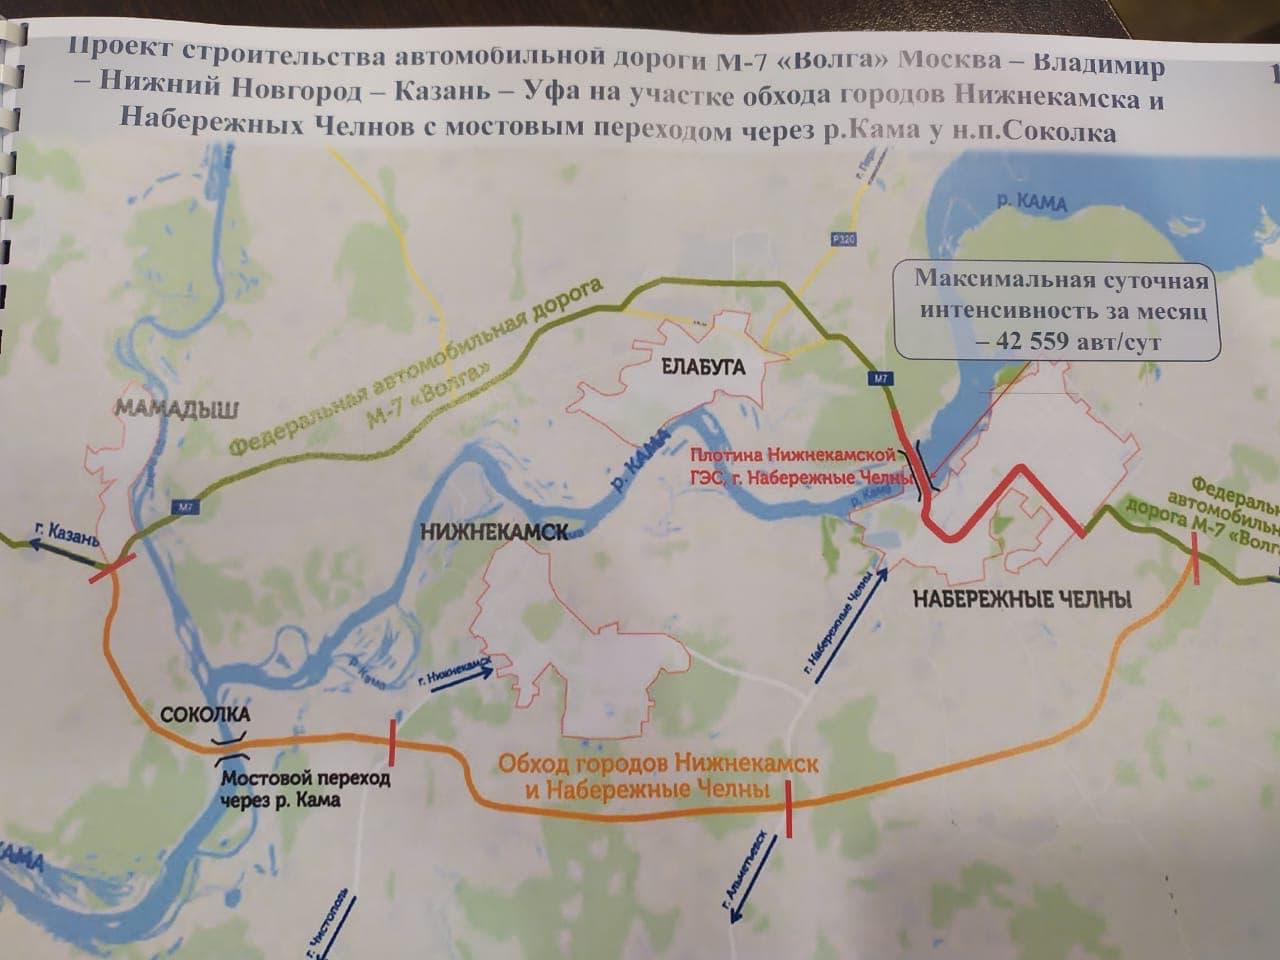 Обход Нижнекамска и Челнов